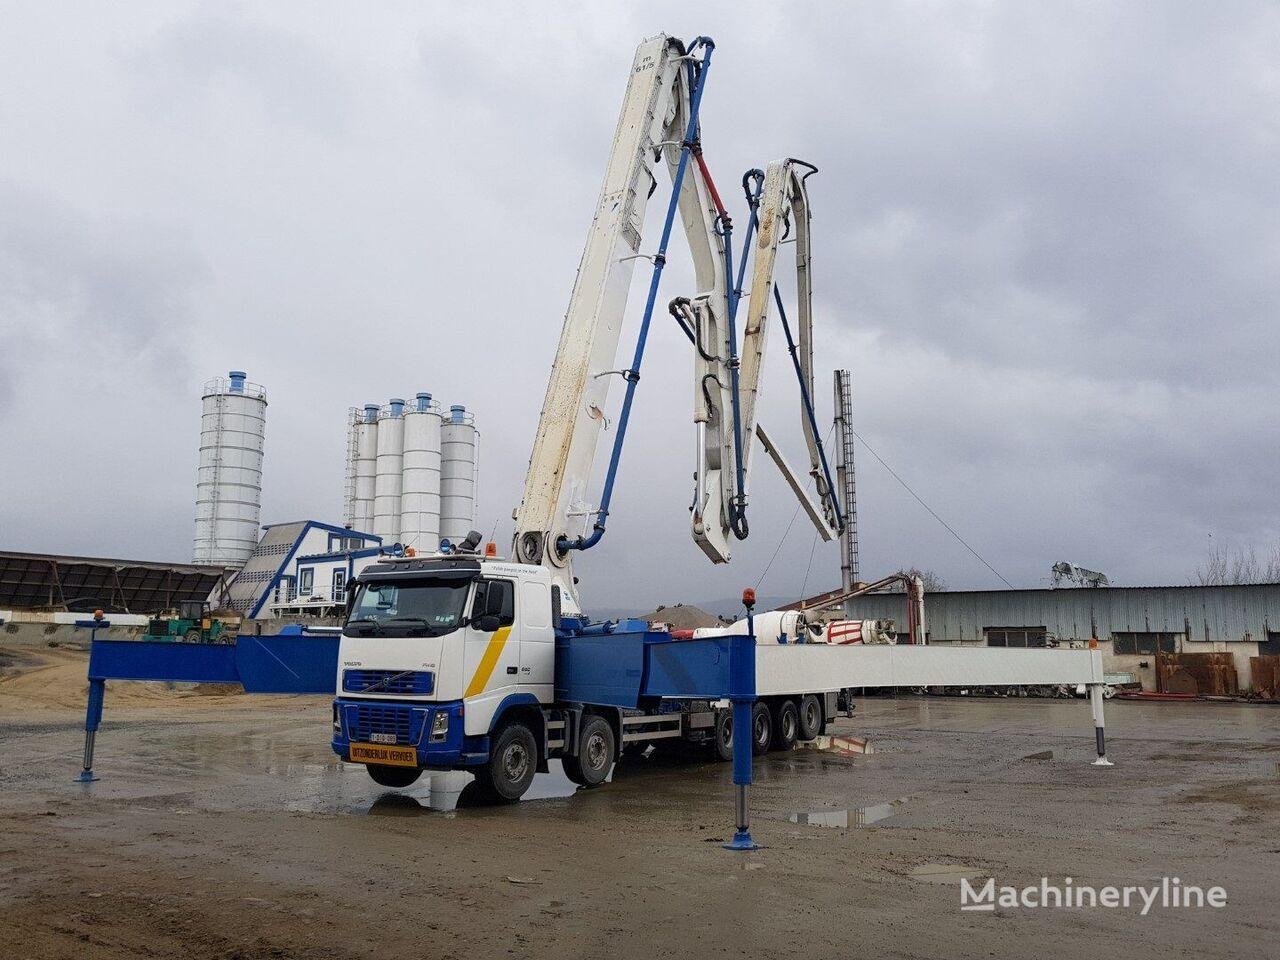 مضخة الخرسانة VOLVO FH 16 580 12x4 Euro 5, 61m concrete pump 200m3/h